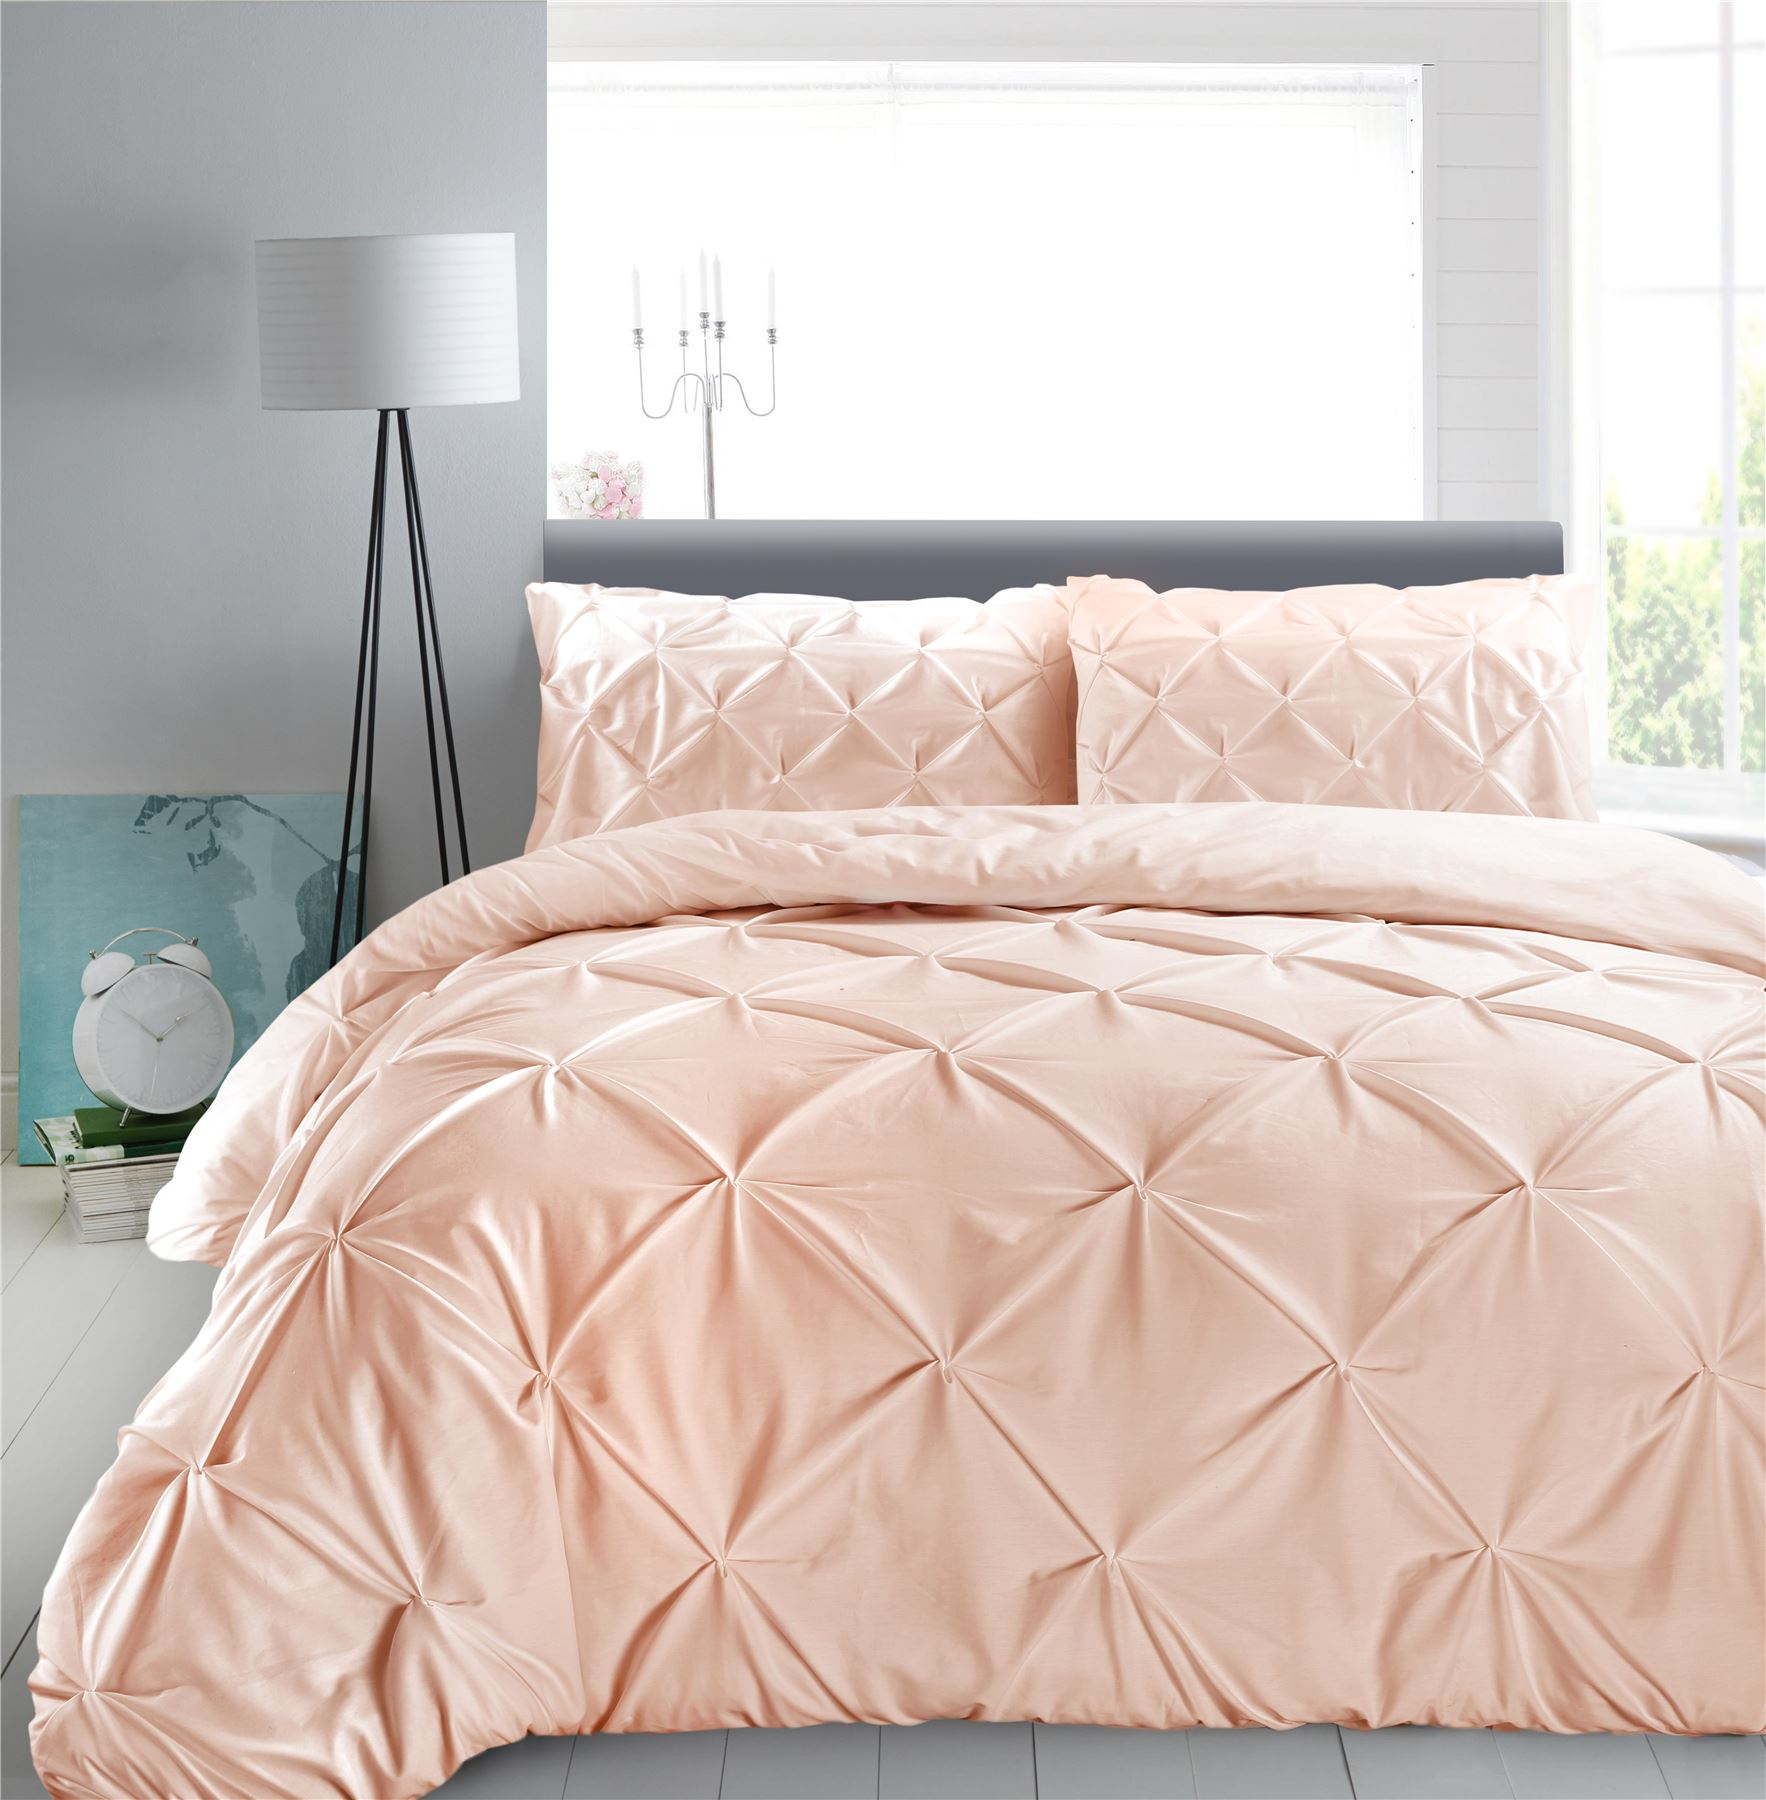 Luxury-Pure-100-Cotton-200-Thread-Pinch-Pleat-Pintuck-Puckering-Duvet-Cover-Set thumbnail 7